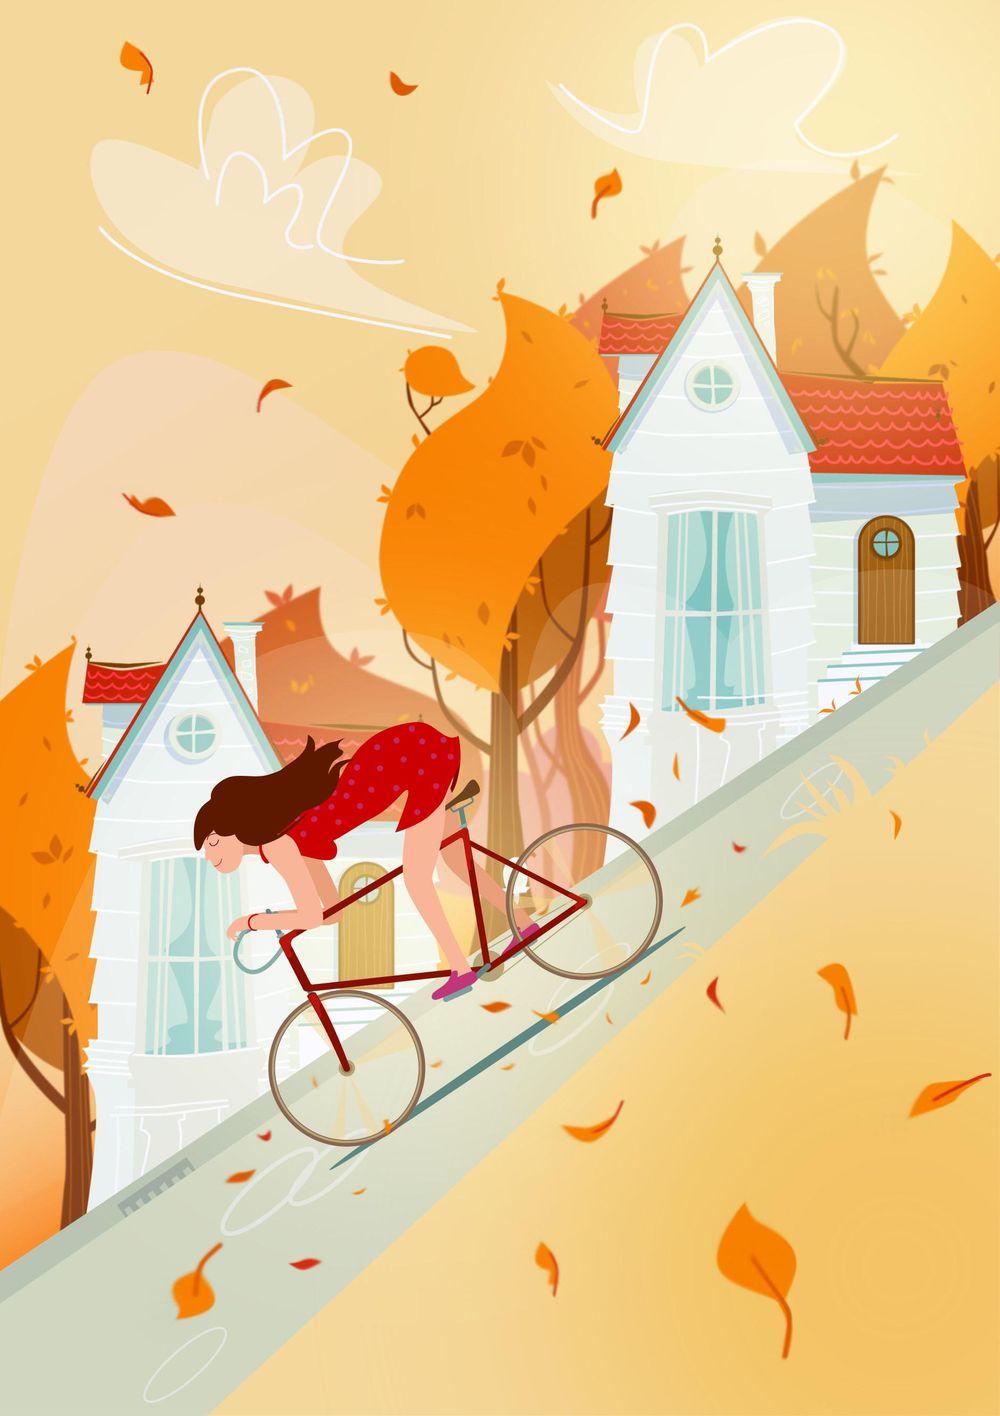 Slope Illustration - image 3 - student project